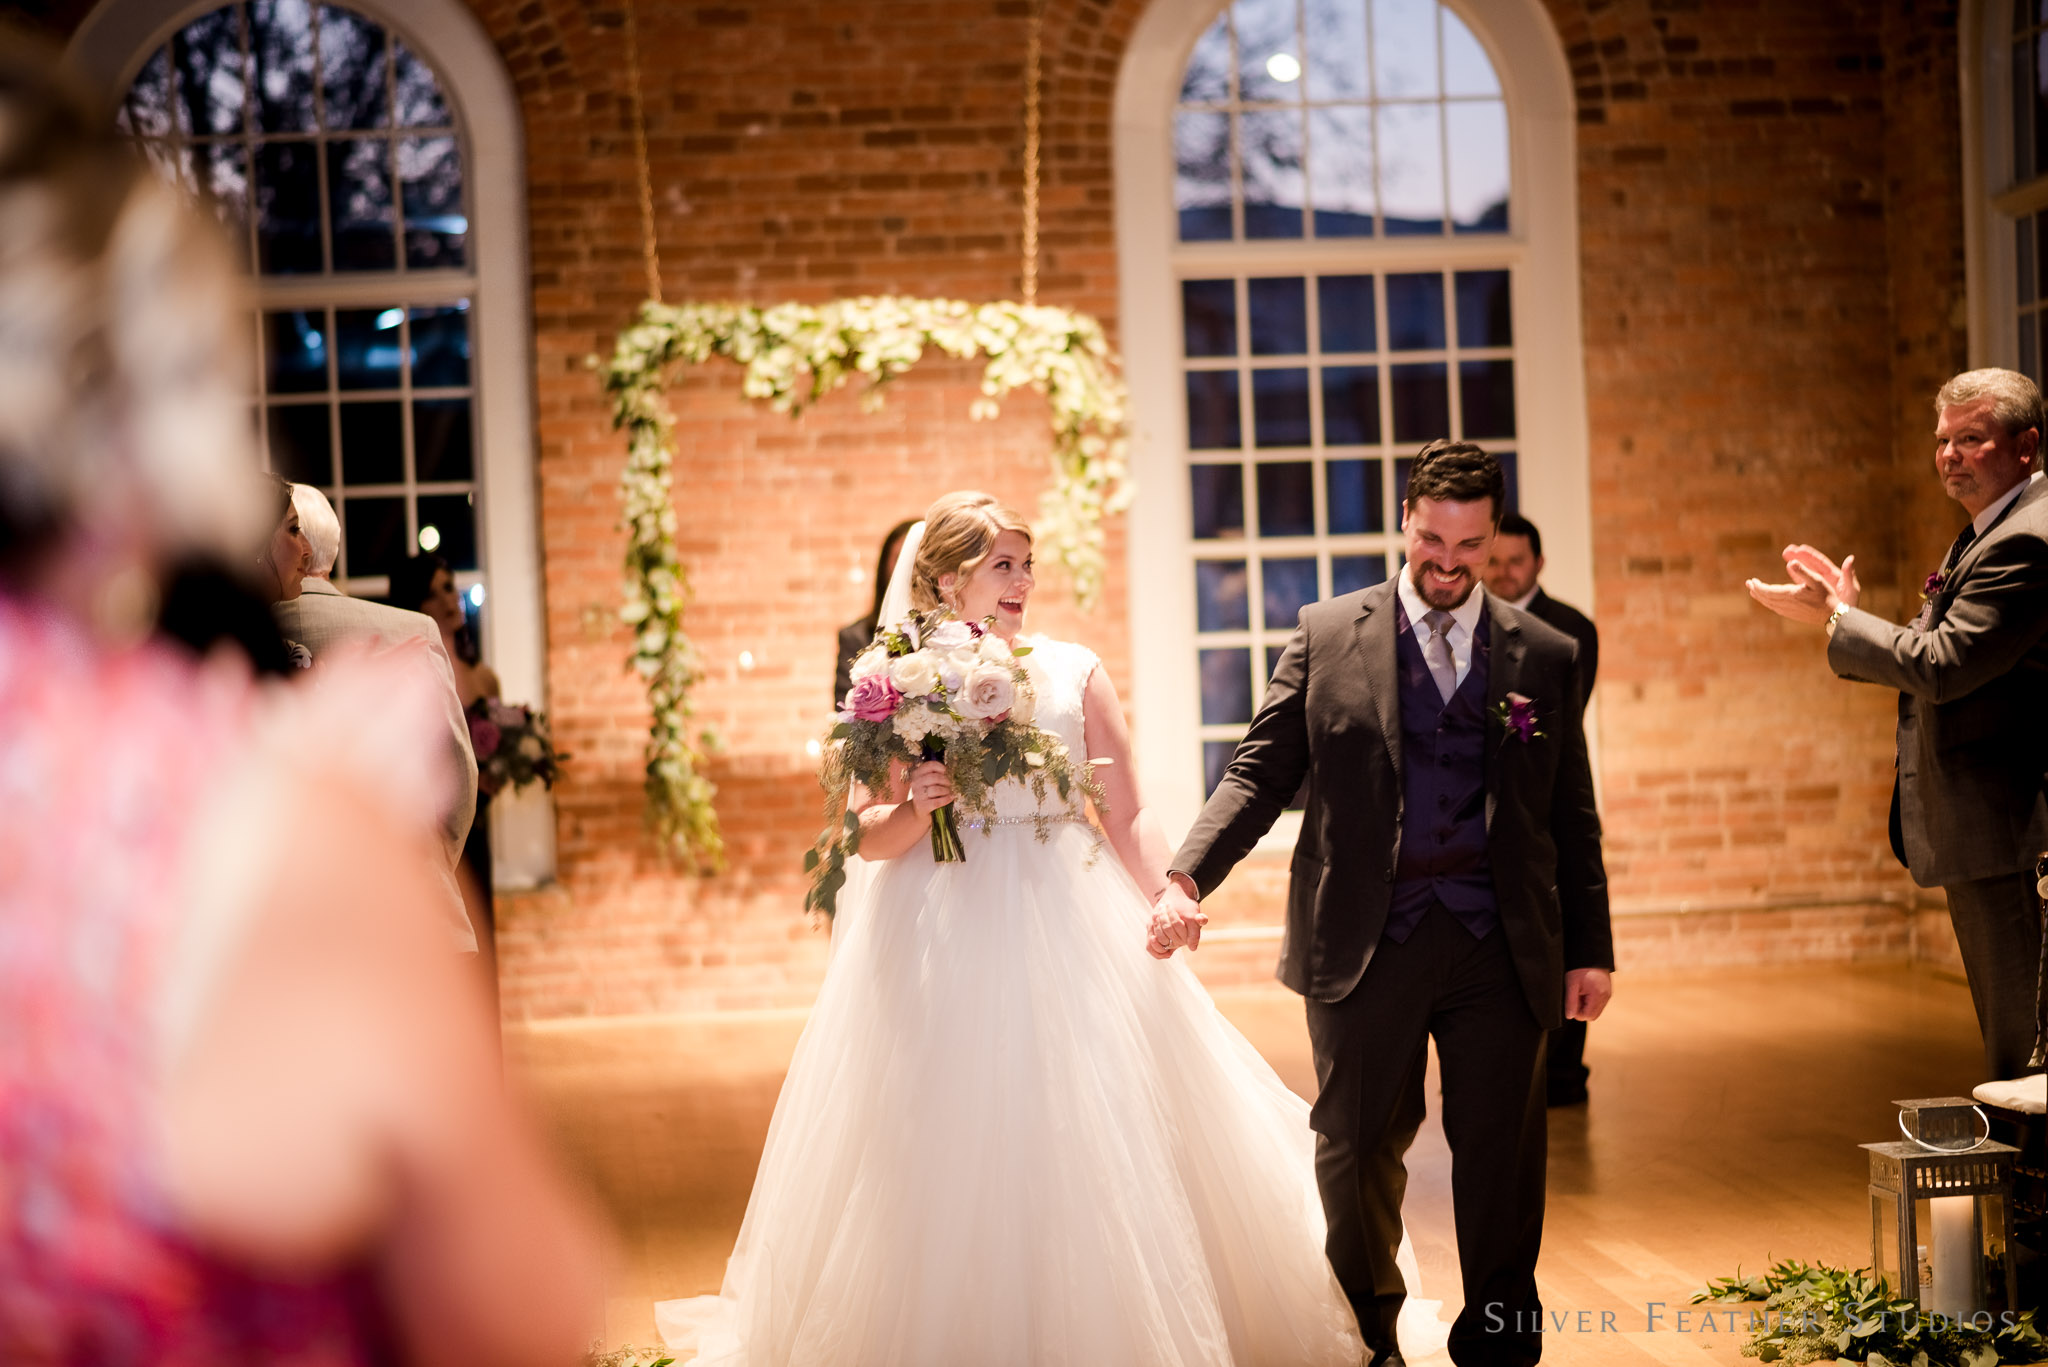 cottom-room-wedding-photography-035.jpg